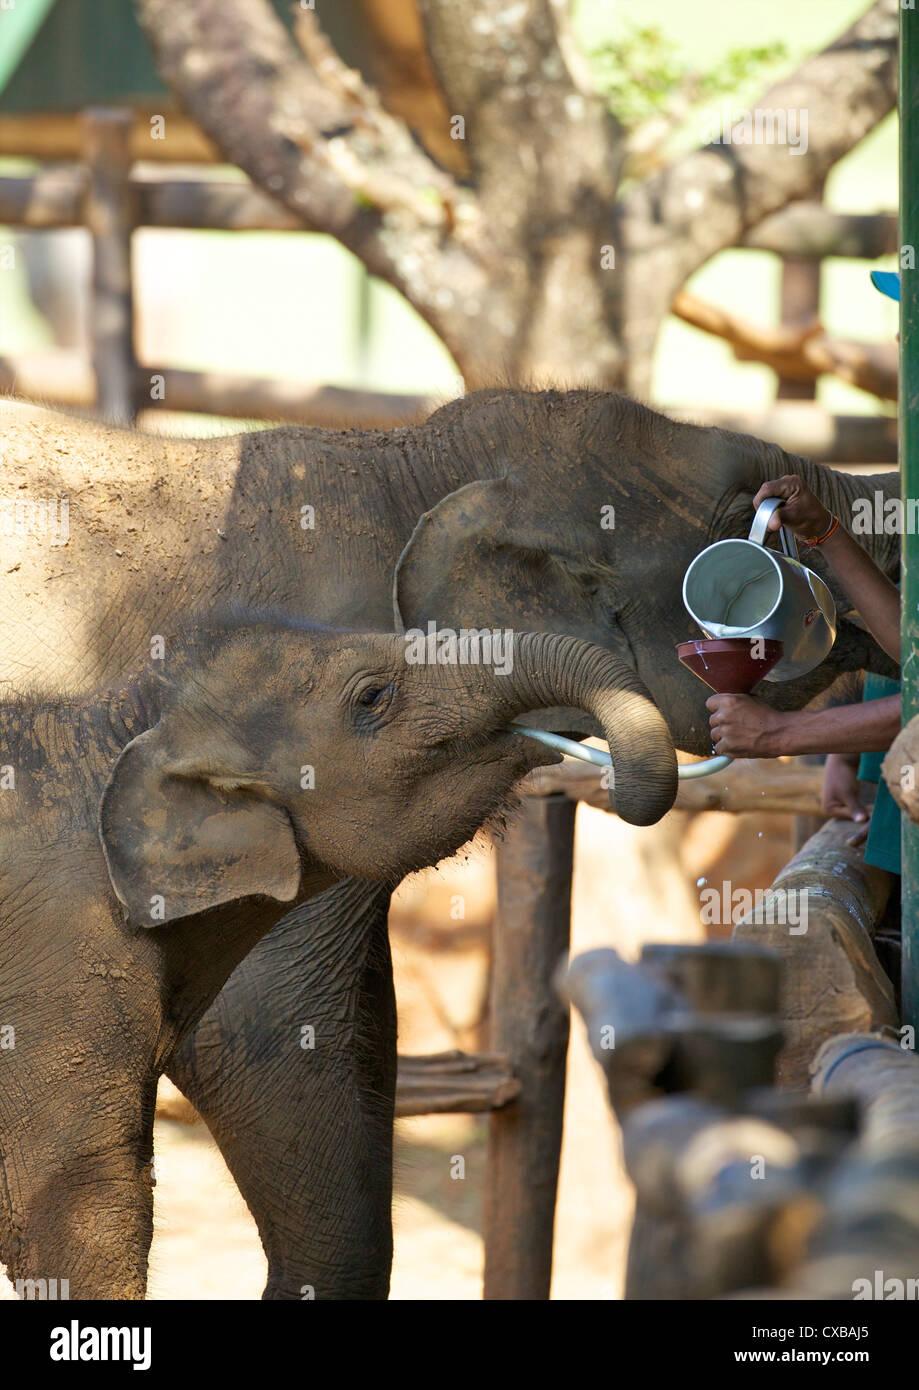 Baby-asiatische Elefanten gefüttert, Uda Walawe Elephant Transit Home, Sri Lanka, Asien Stockbild